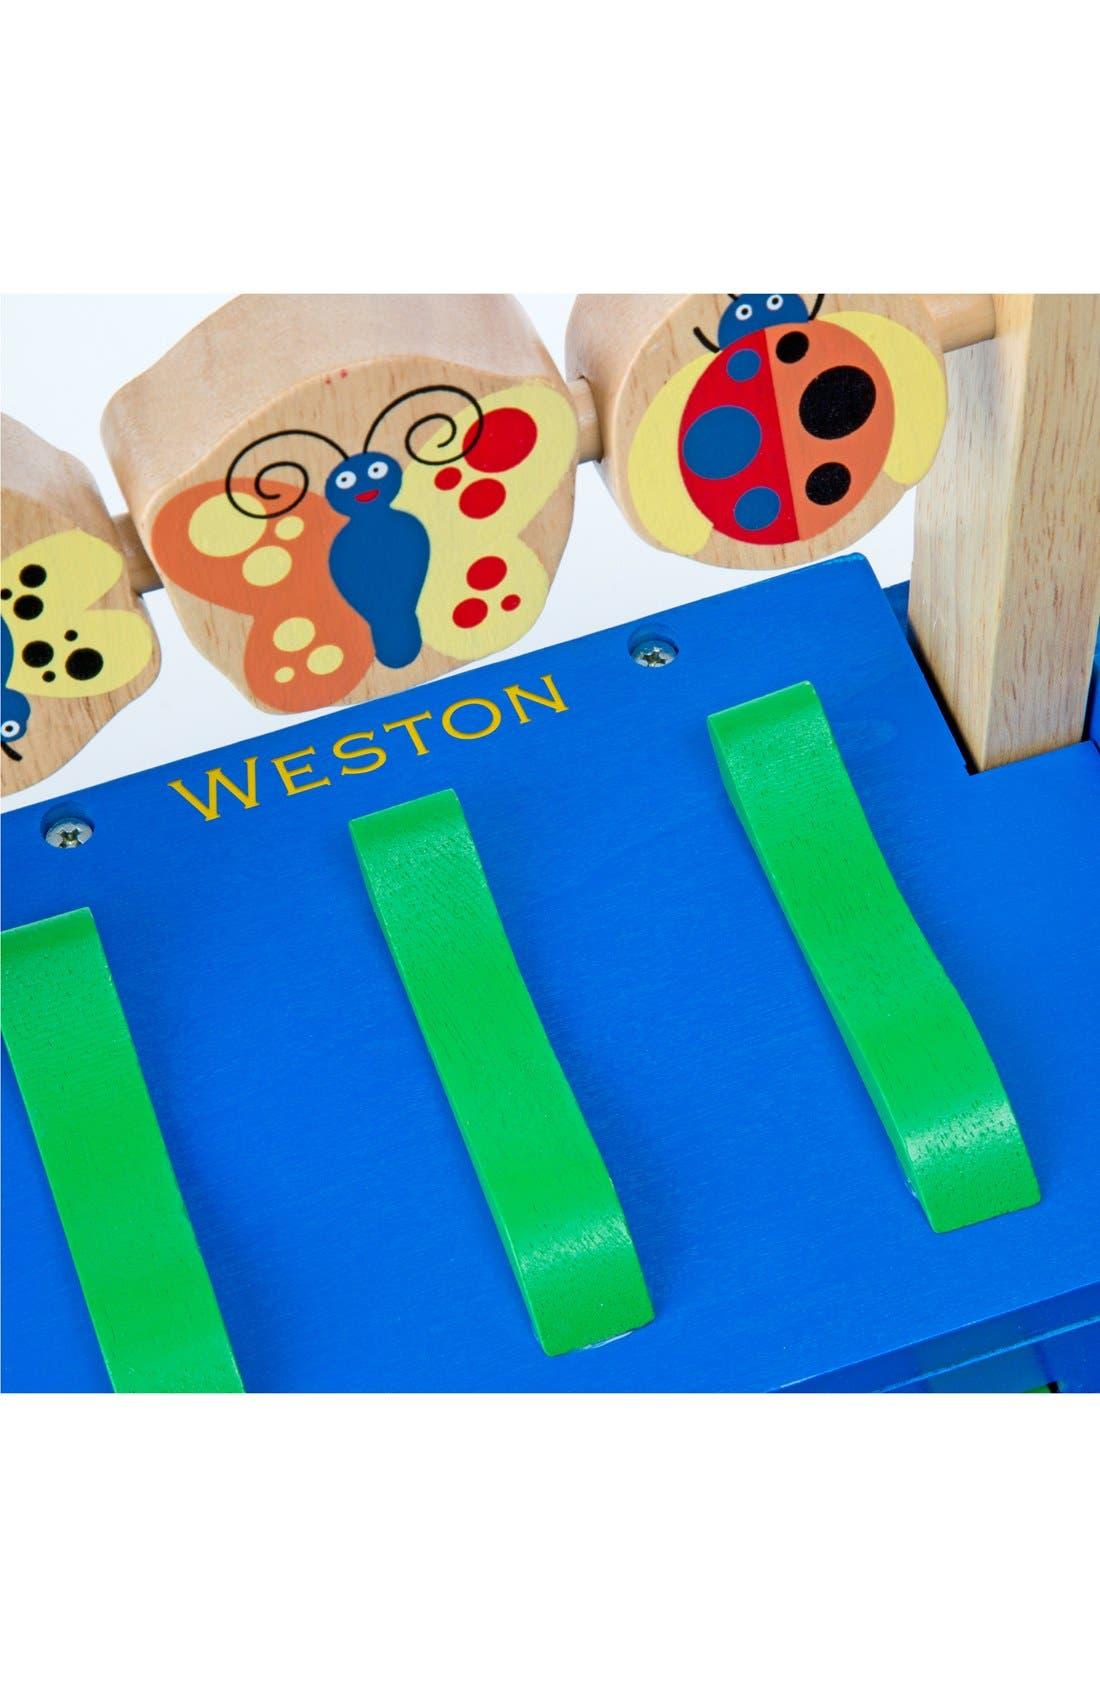 'Chomp & Clack' Personalized Alligator Push Toy,                             Alternate thumbnail 2, color,                             BLUE